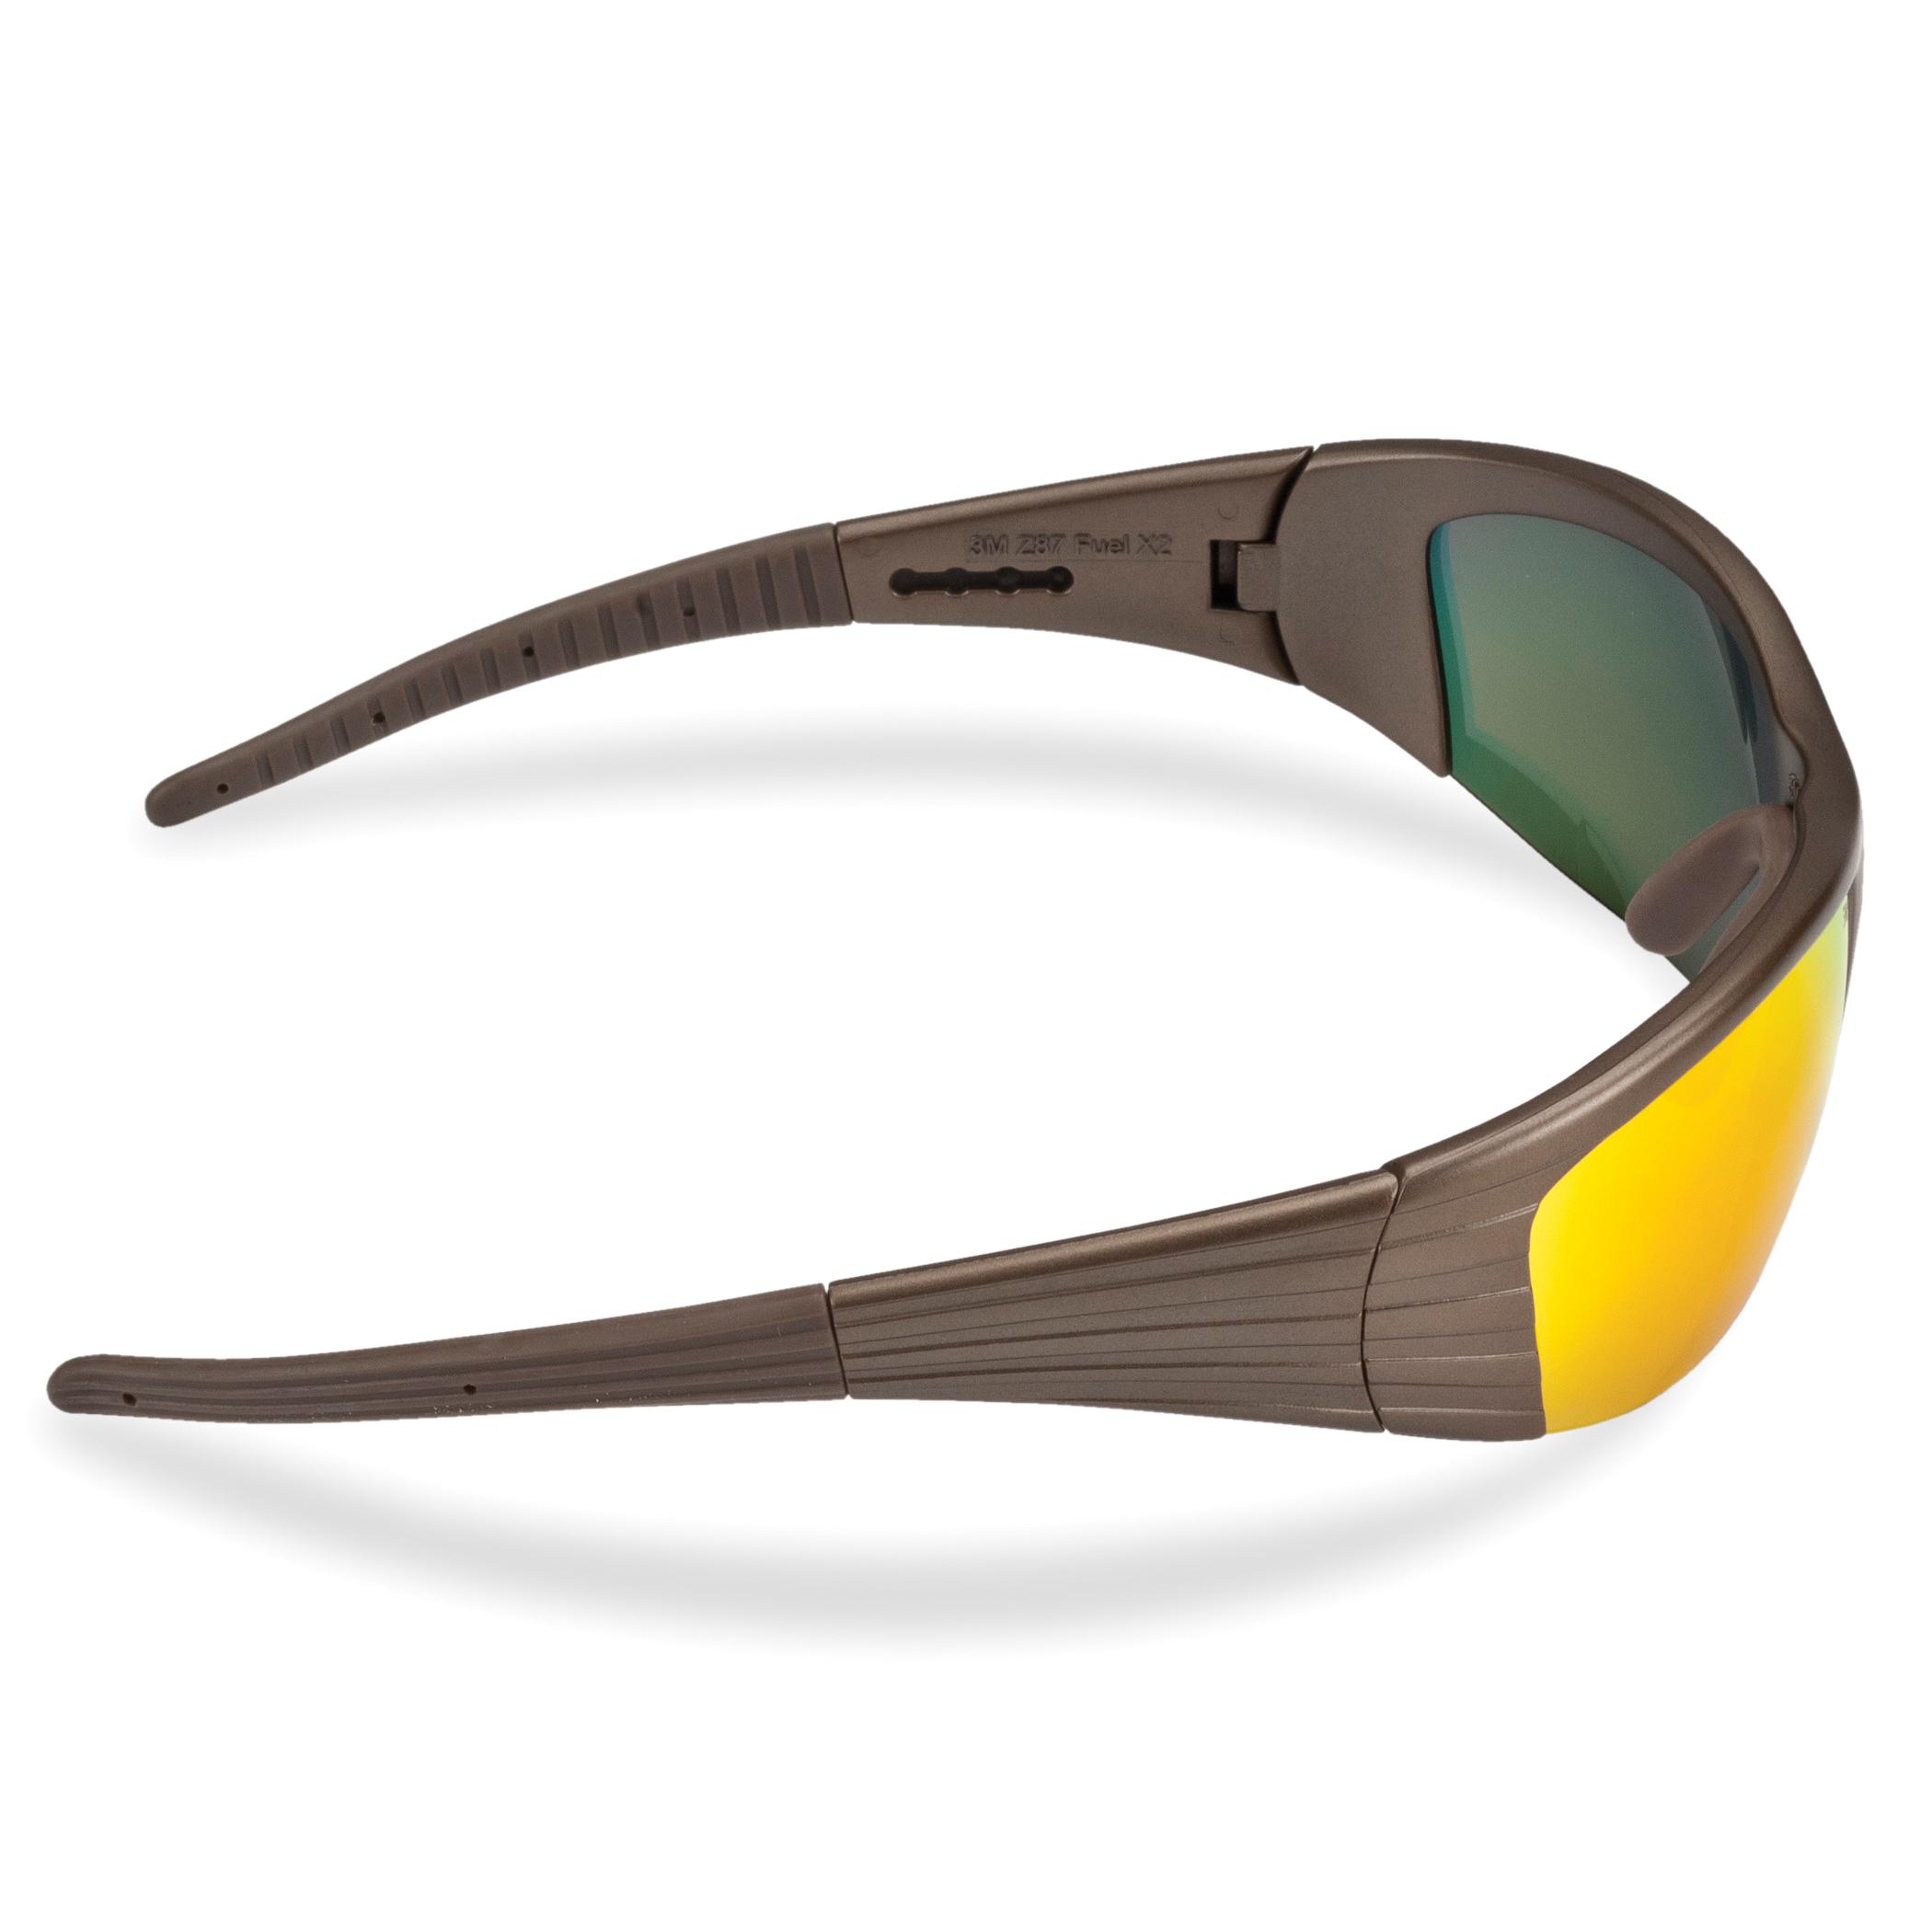 3M™ Fuel™ 078371-11635 11635-00000-10 X2 Premium Protective Eyewear, Anti-Scratch Red Mirror Lens, Half Framed Dark Copper Plastic Frame, Polycarbonate Lens, Specifications Met: ANSI Z87.1-2015